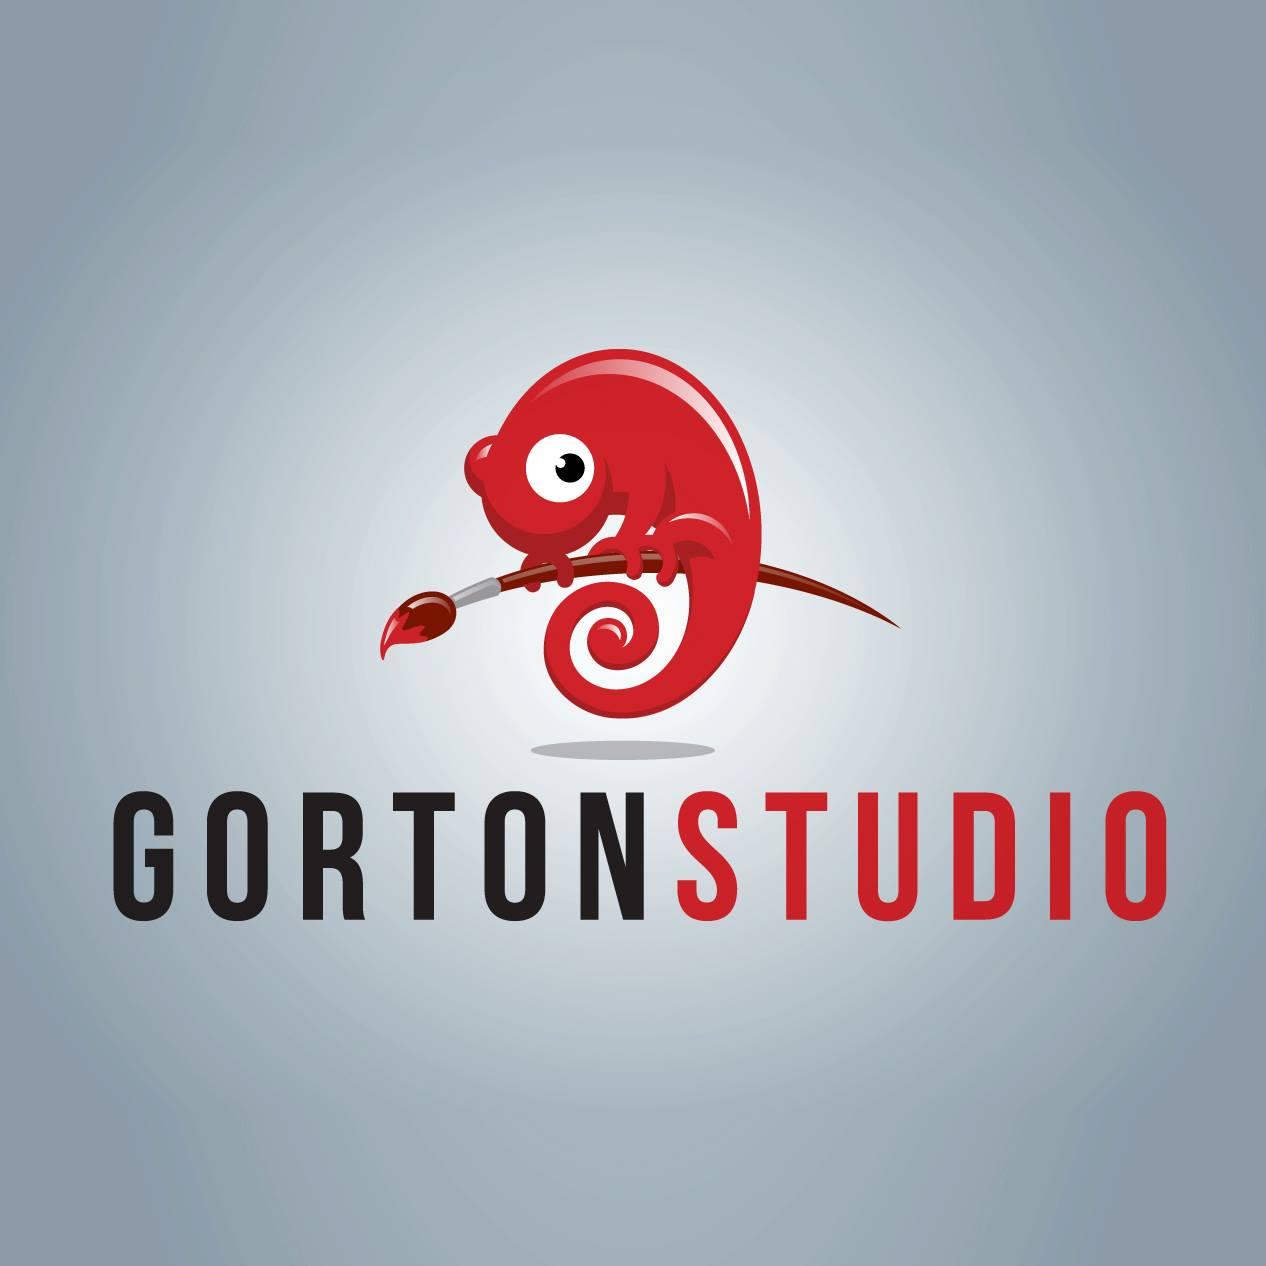 LauraOdettePhipps-GortonStudio-ProstheticsLecture.jpg